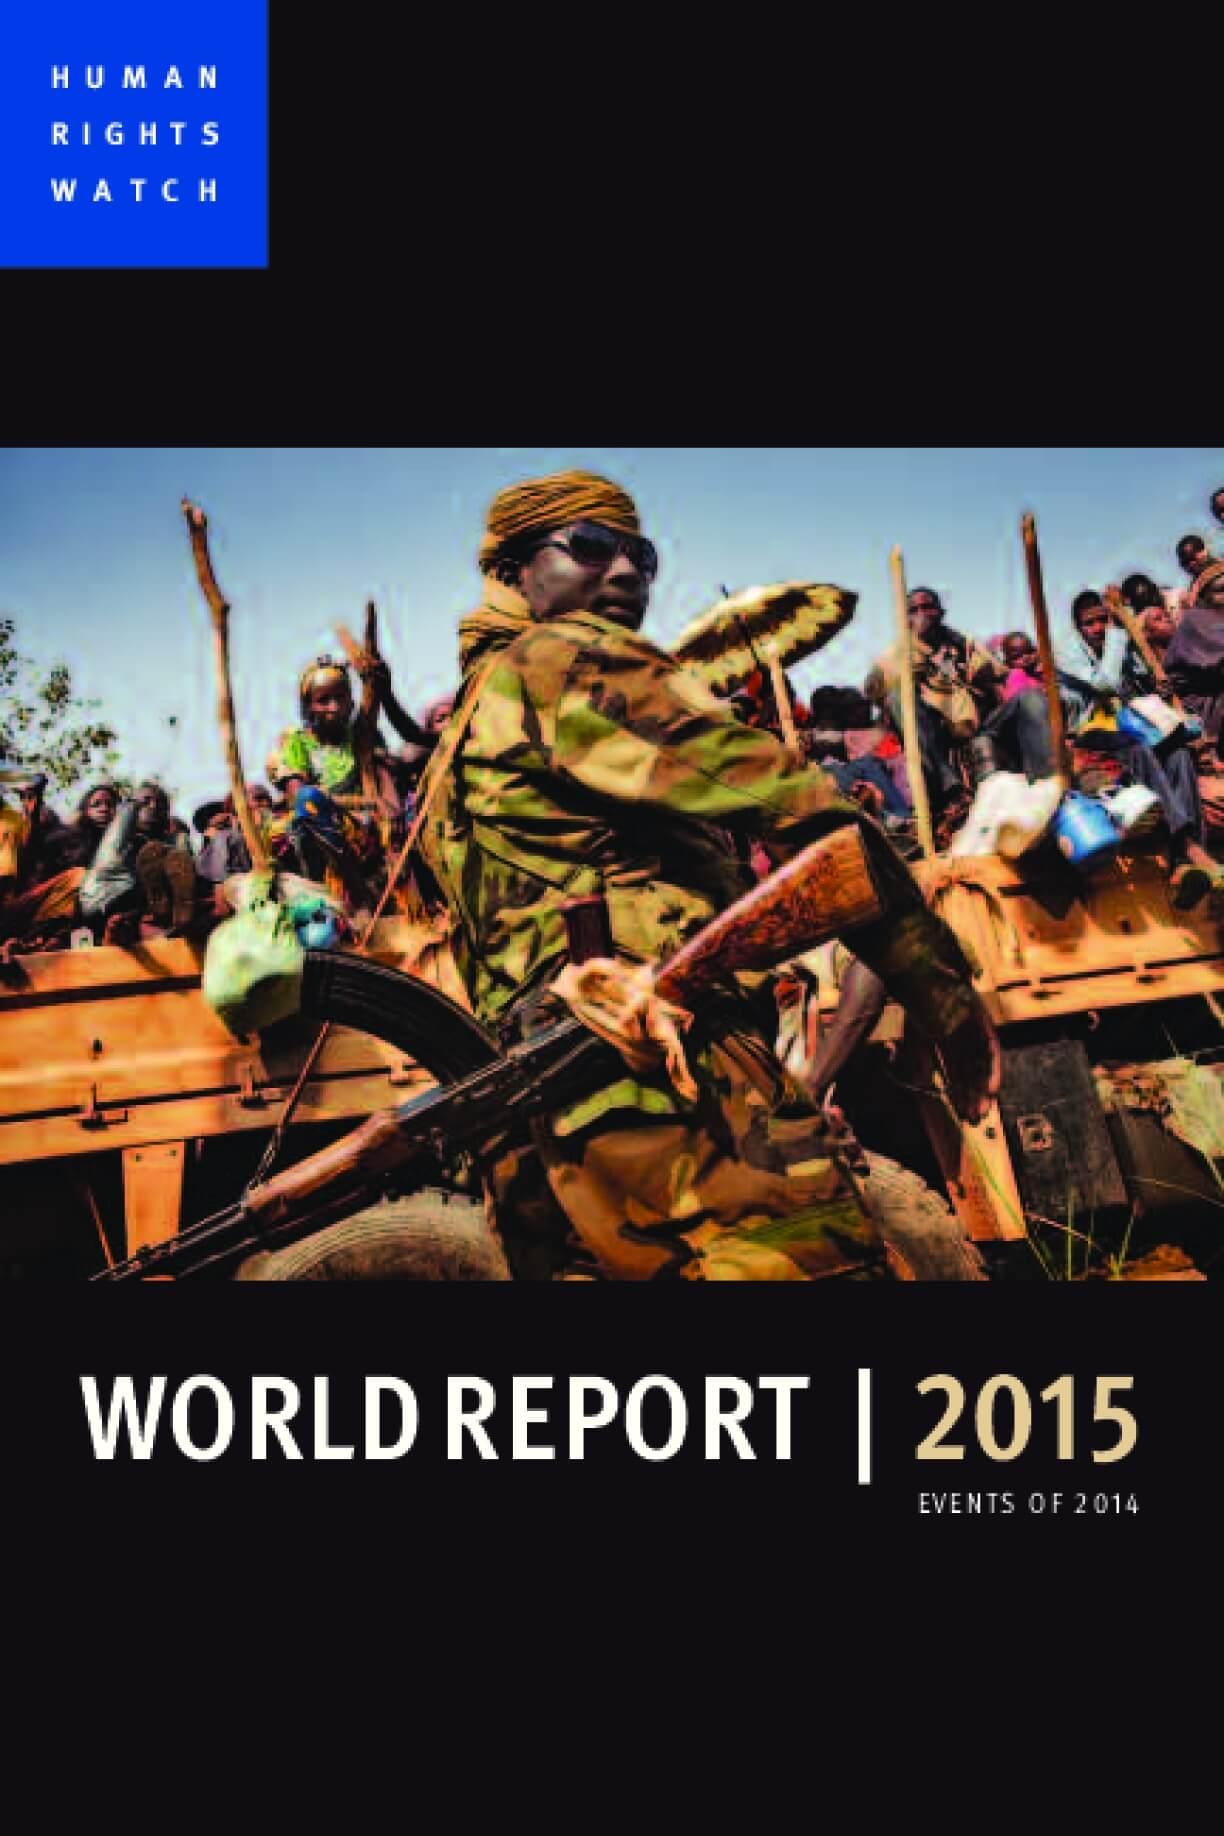 World Report 2015